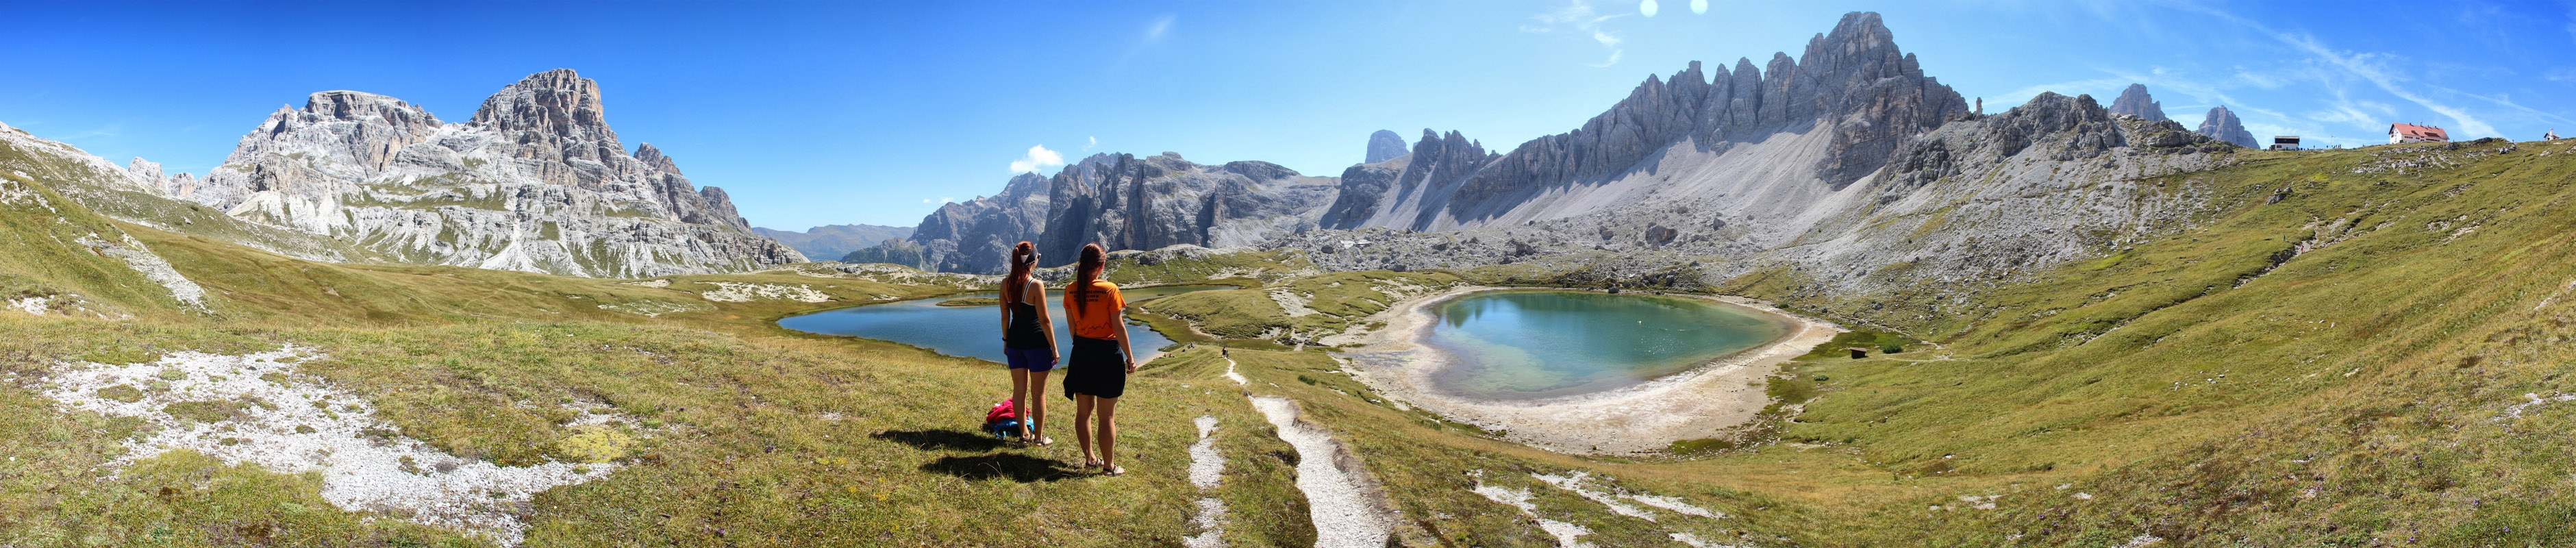 Panoráma Schusterplatte, Crode Fiscaline, Croda dei Toni, Monte Paterno, Dolomity